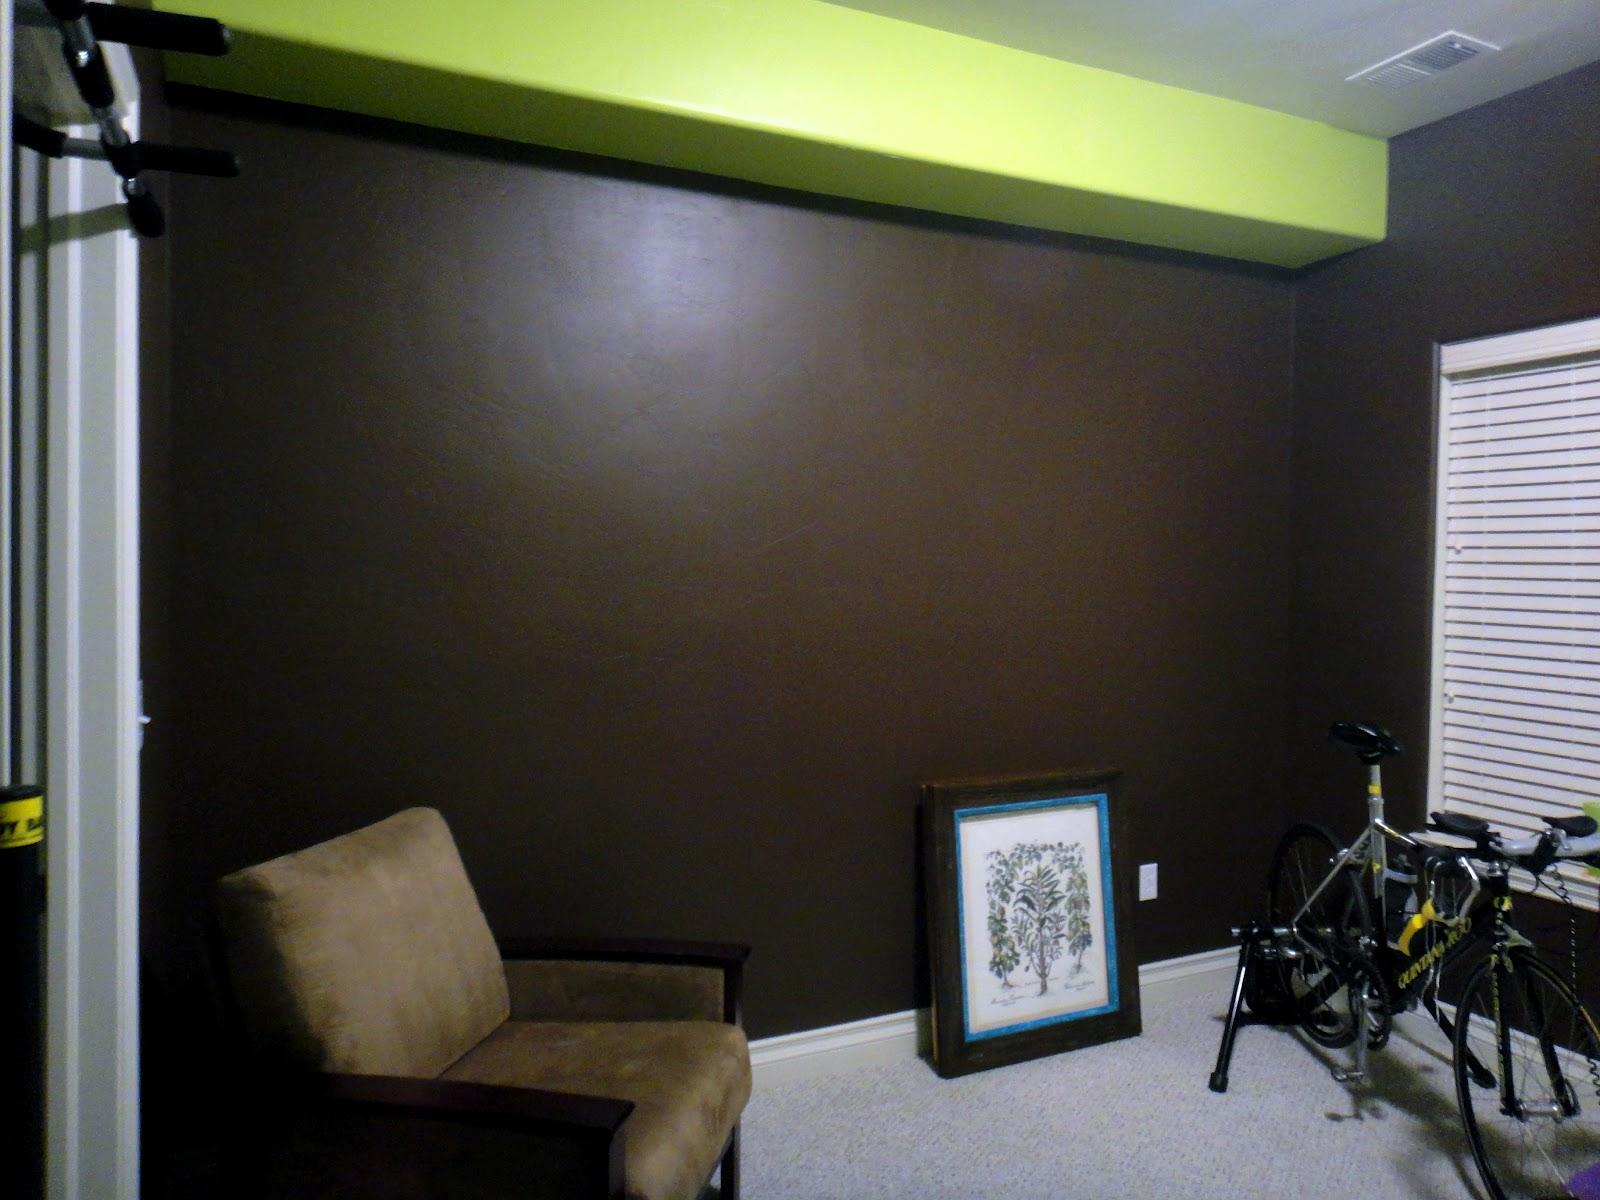 Worth Pinning: Playroom Wall- Adding the Vinyl Trees